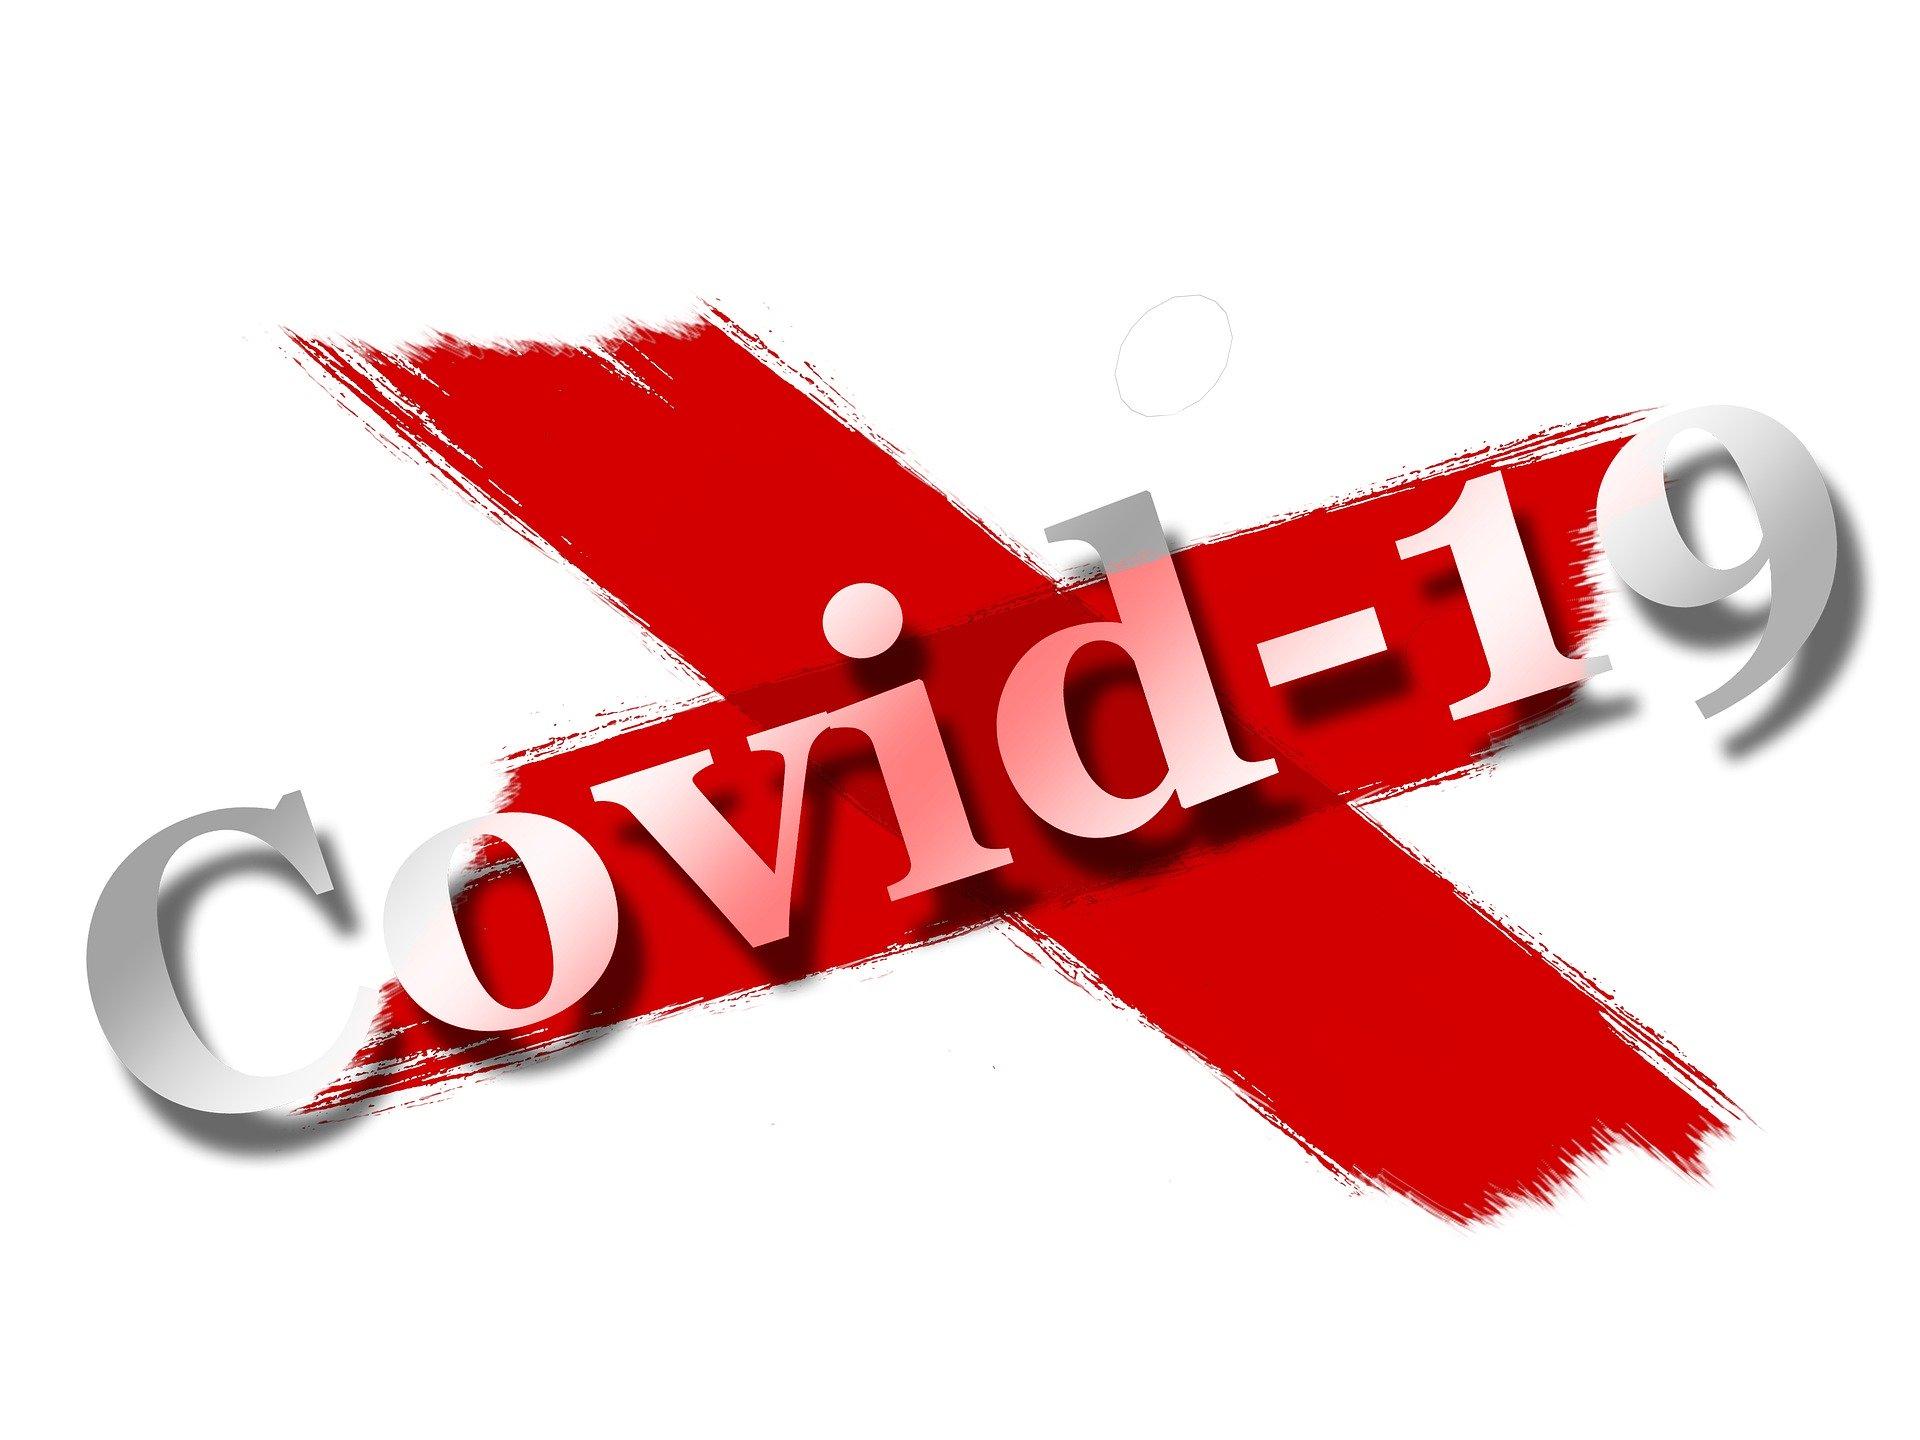 Стало известно, где в Пензе можно пройти тест на коронавирус | РИА ...